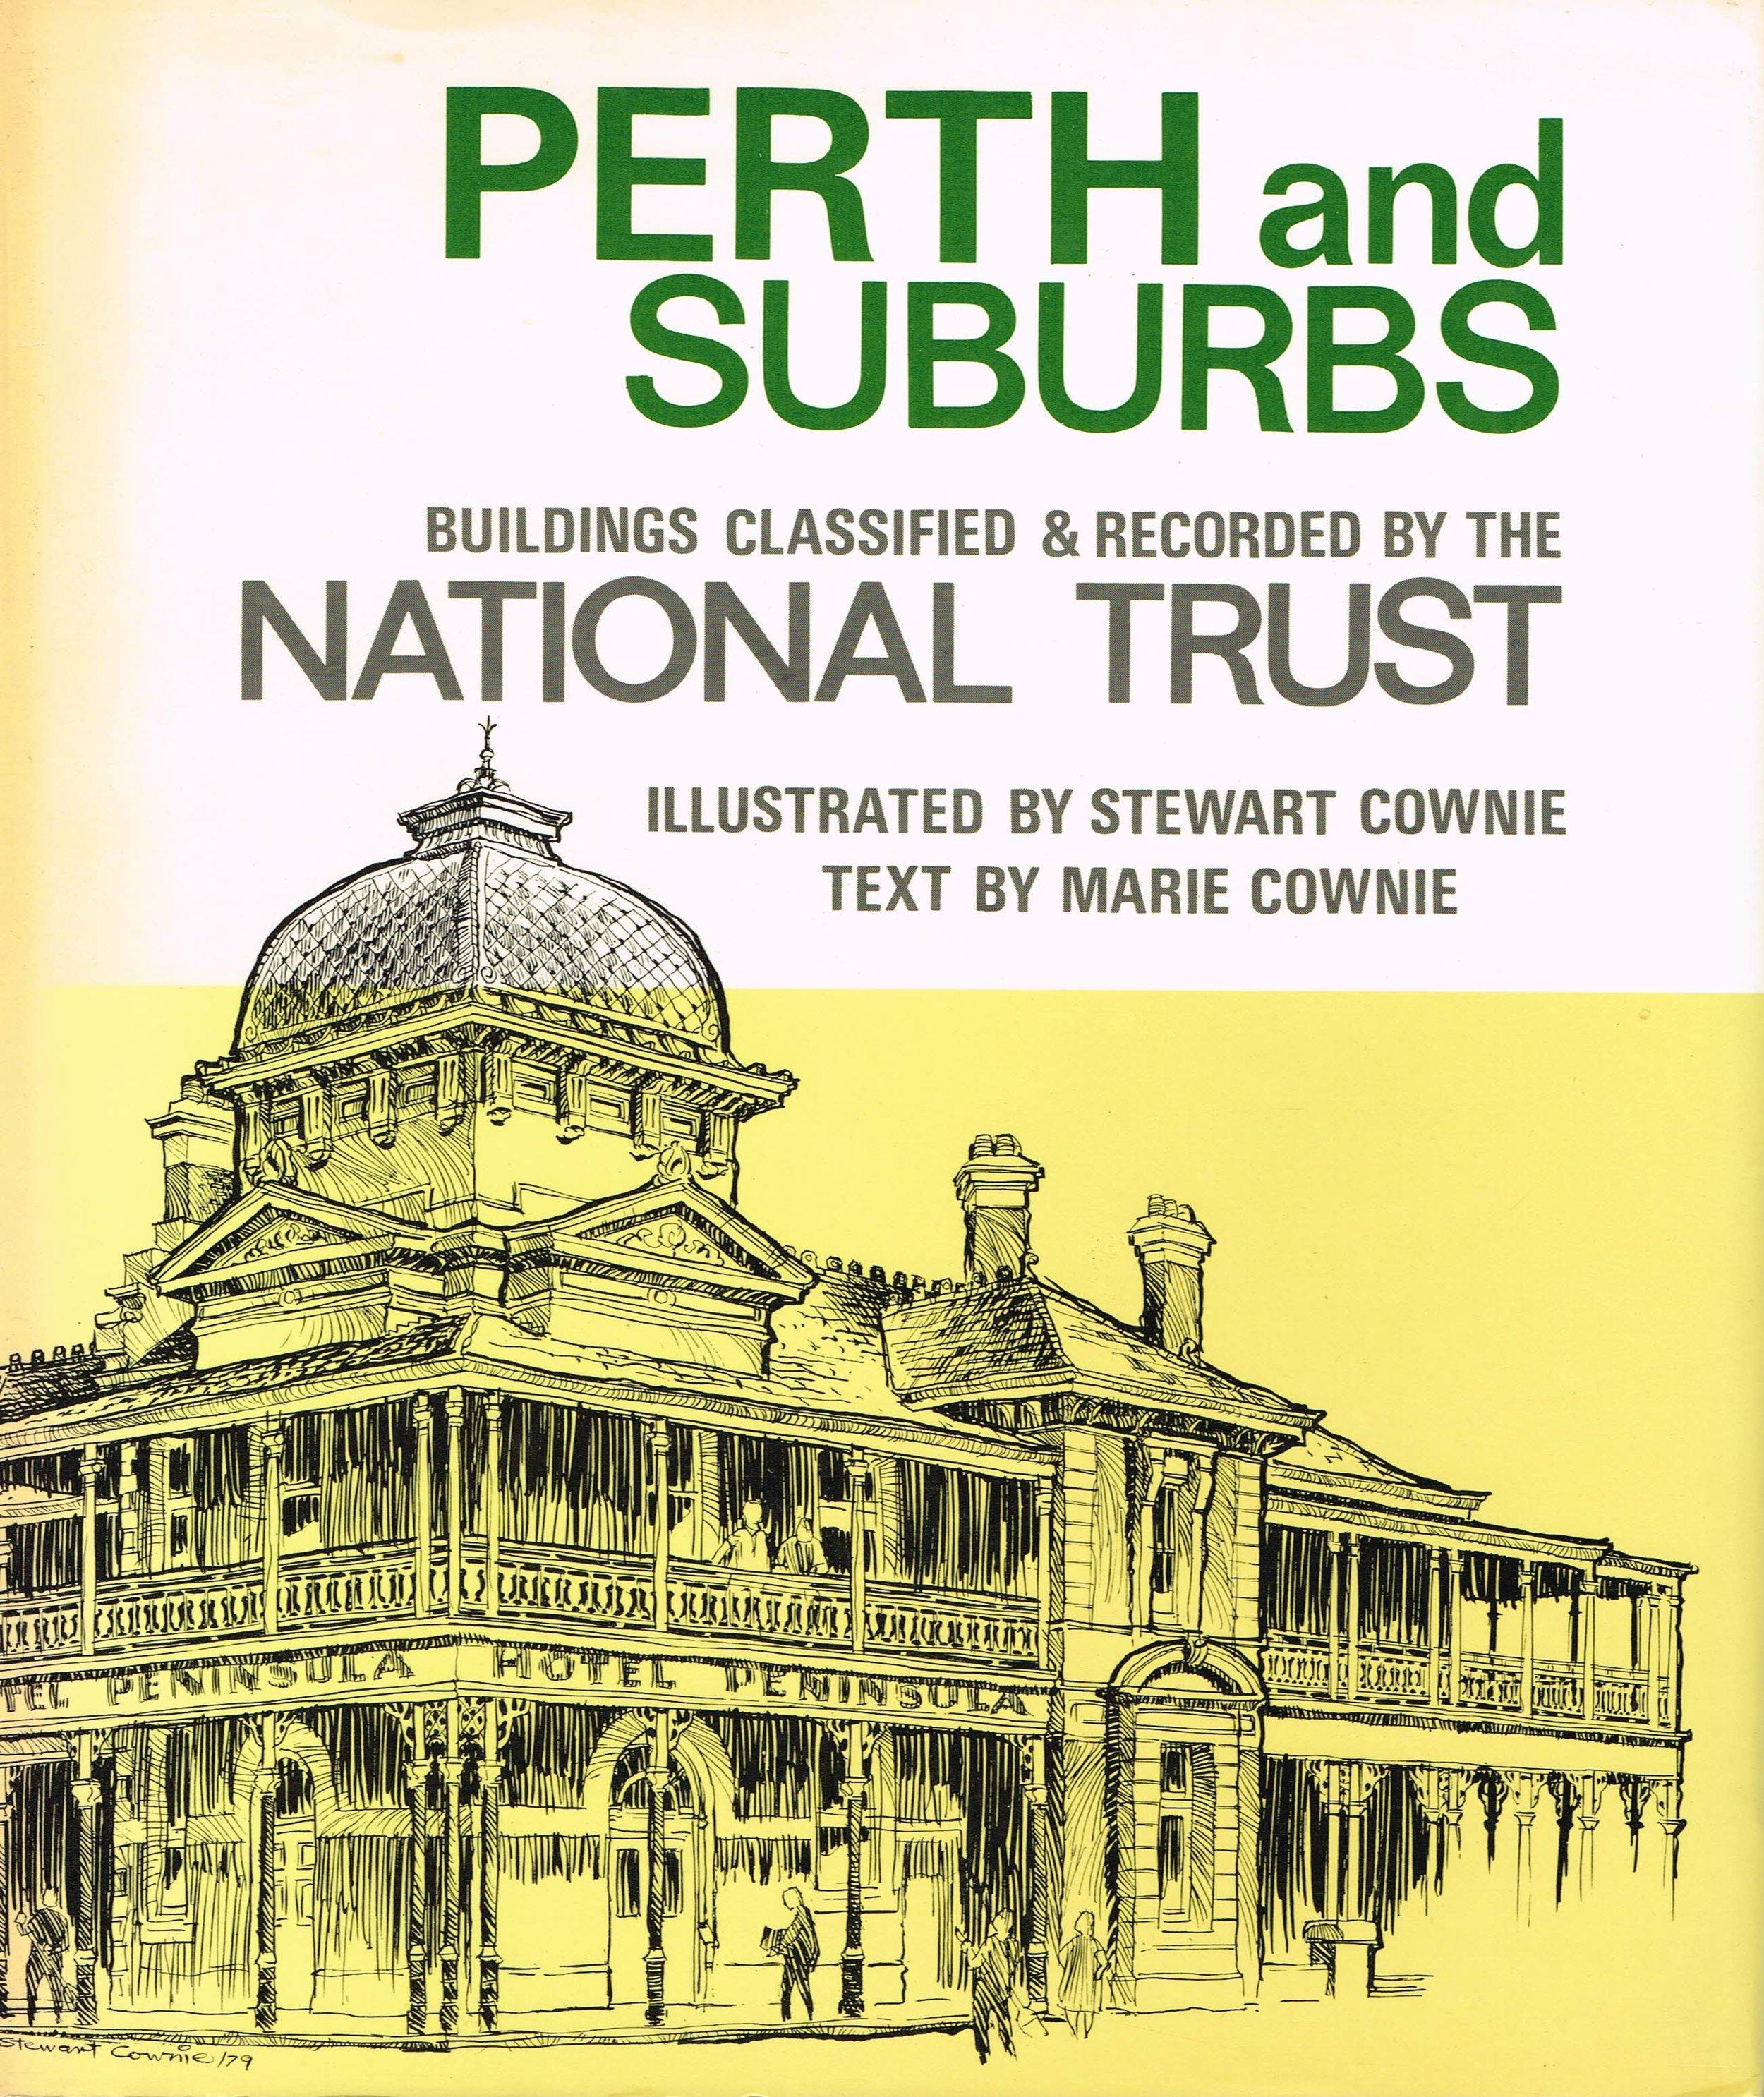 Perth+and+Suburbs.jpg